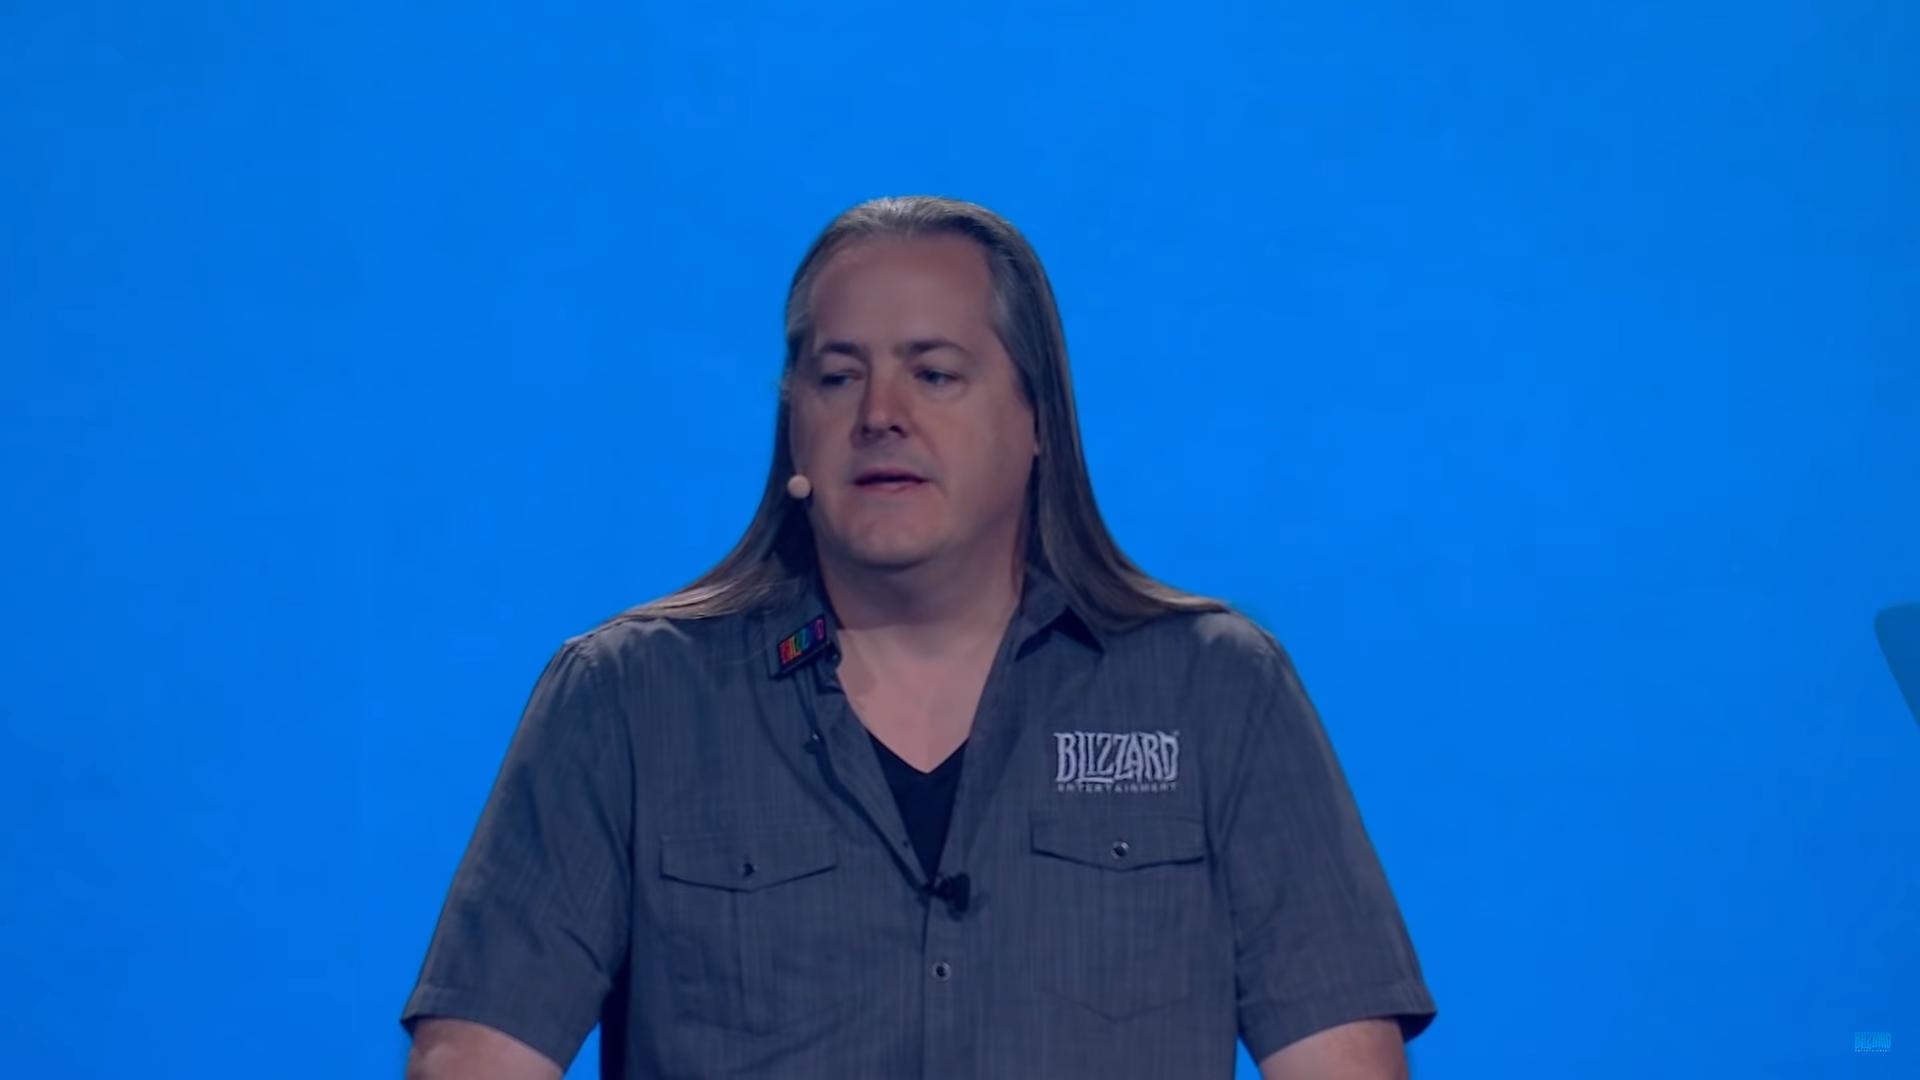 J. Allen Brack with a blue background, on the BlizzCon livestream